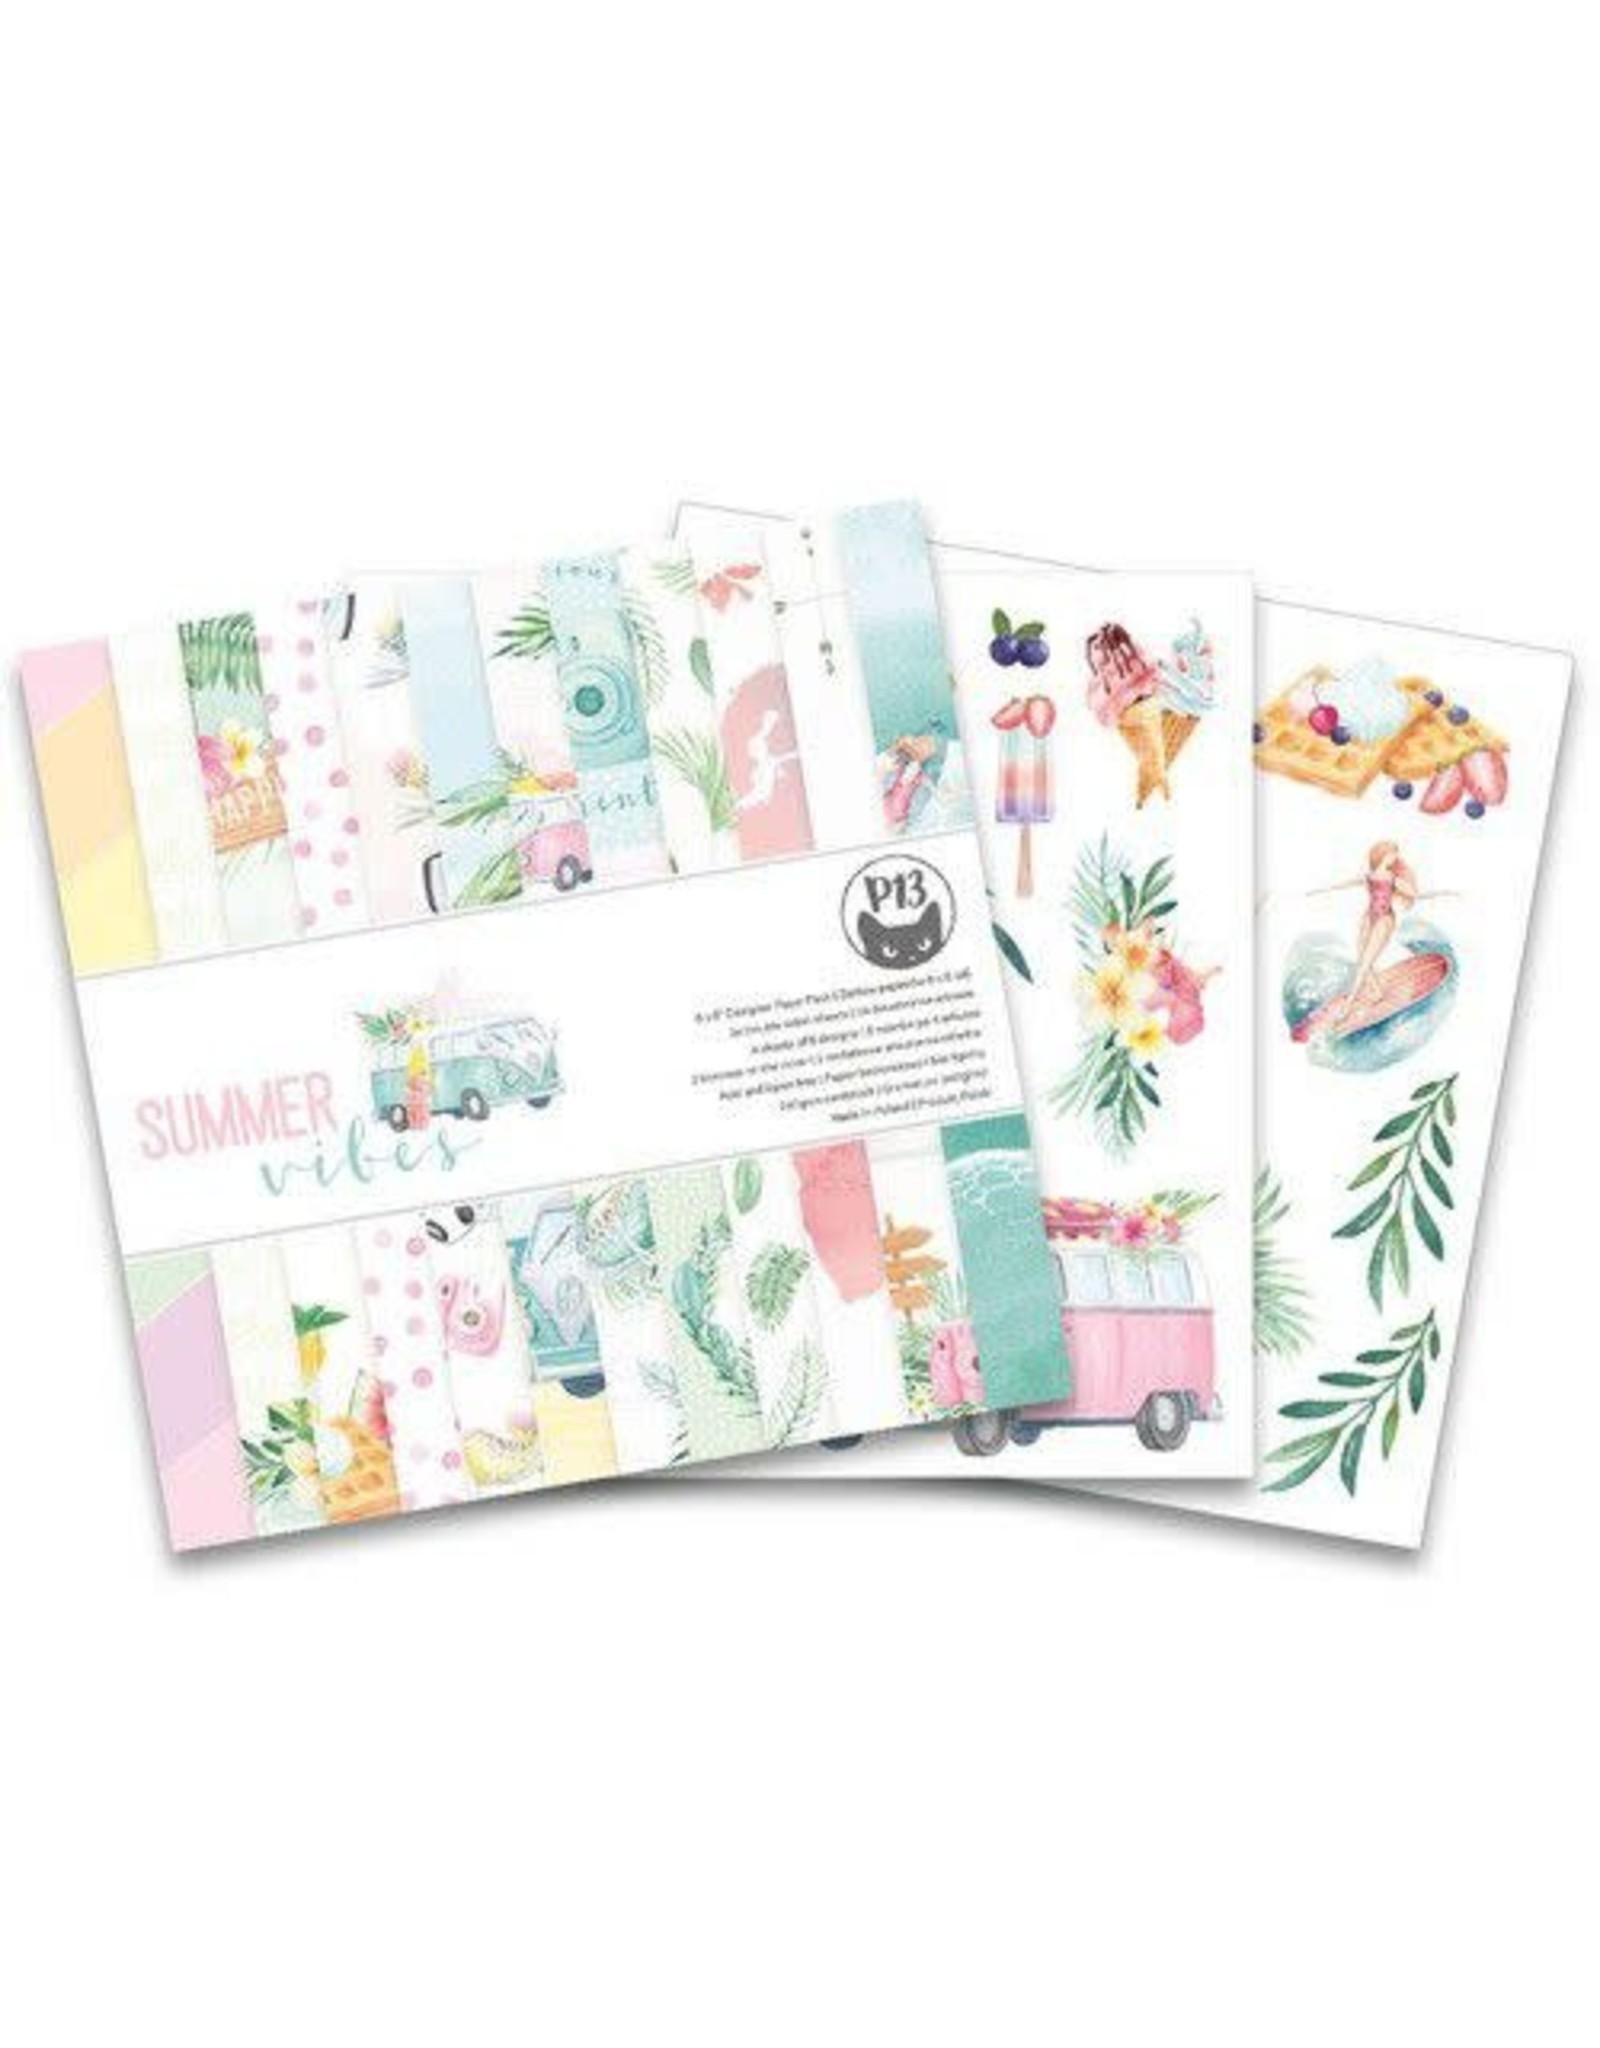 Piatek Piatek13 - Paper pad Summer vibes, 6x6'' P13-VIB-09